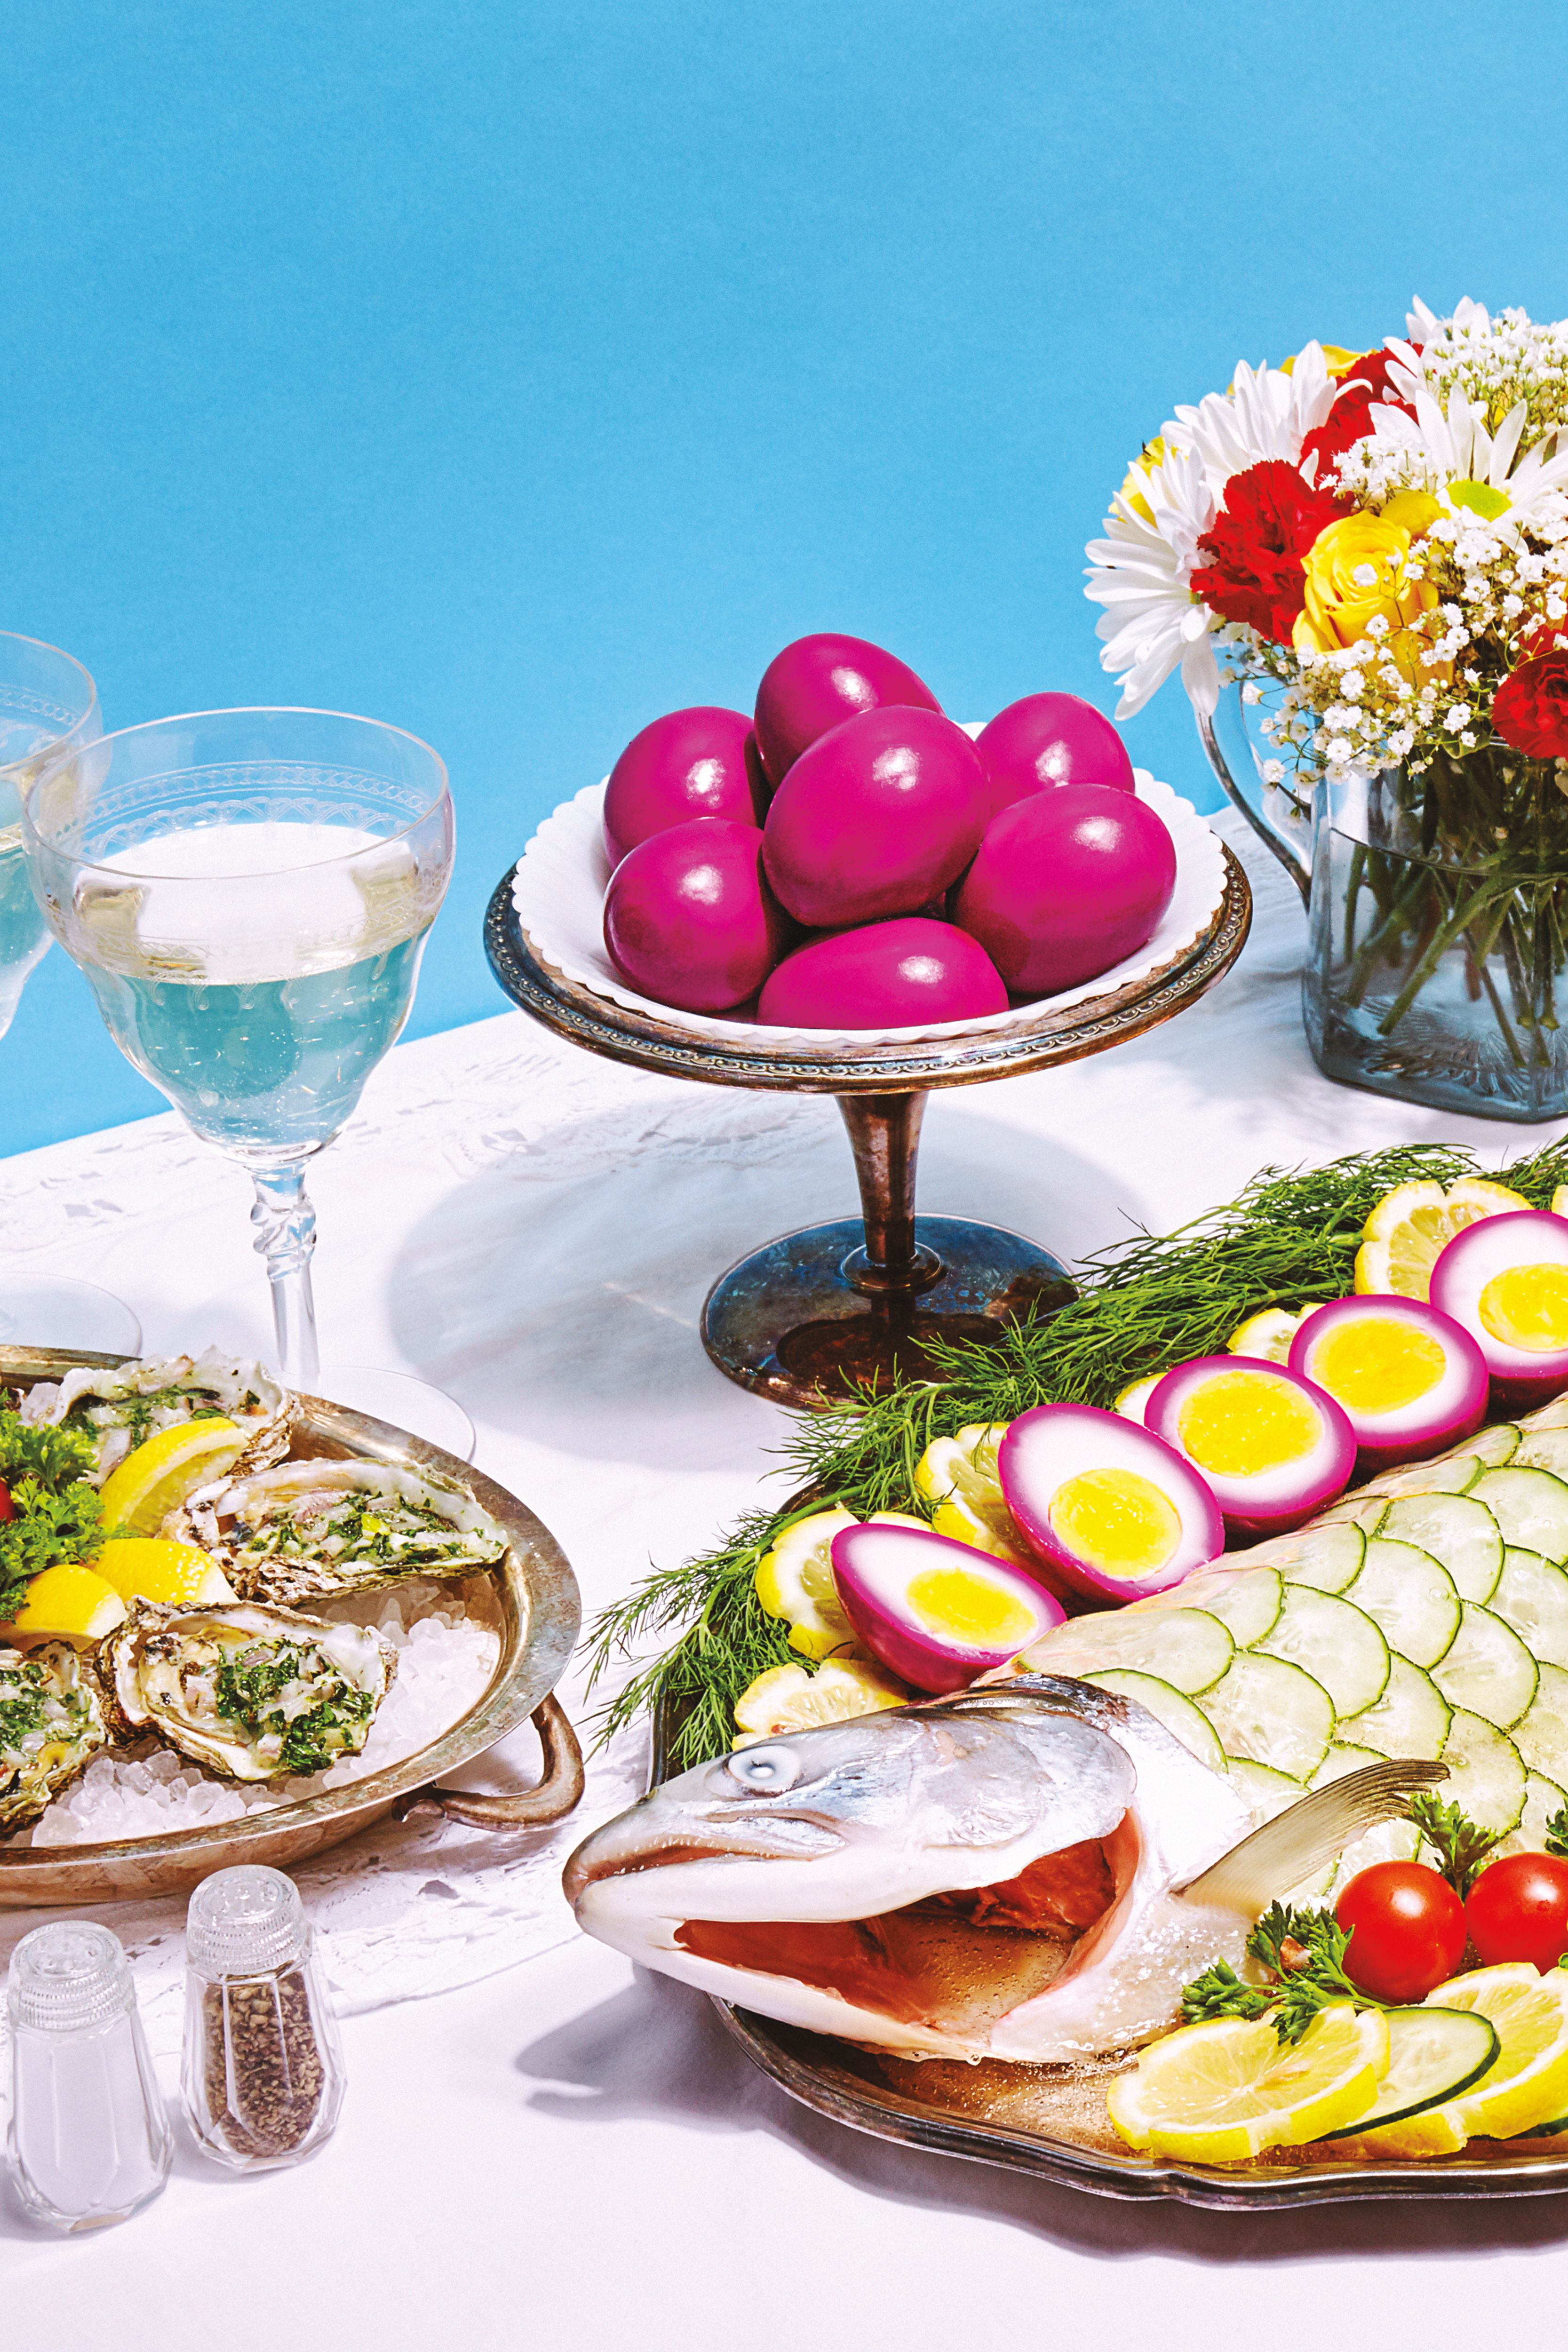 Food history james beard seafood buffet rqbnod